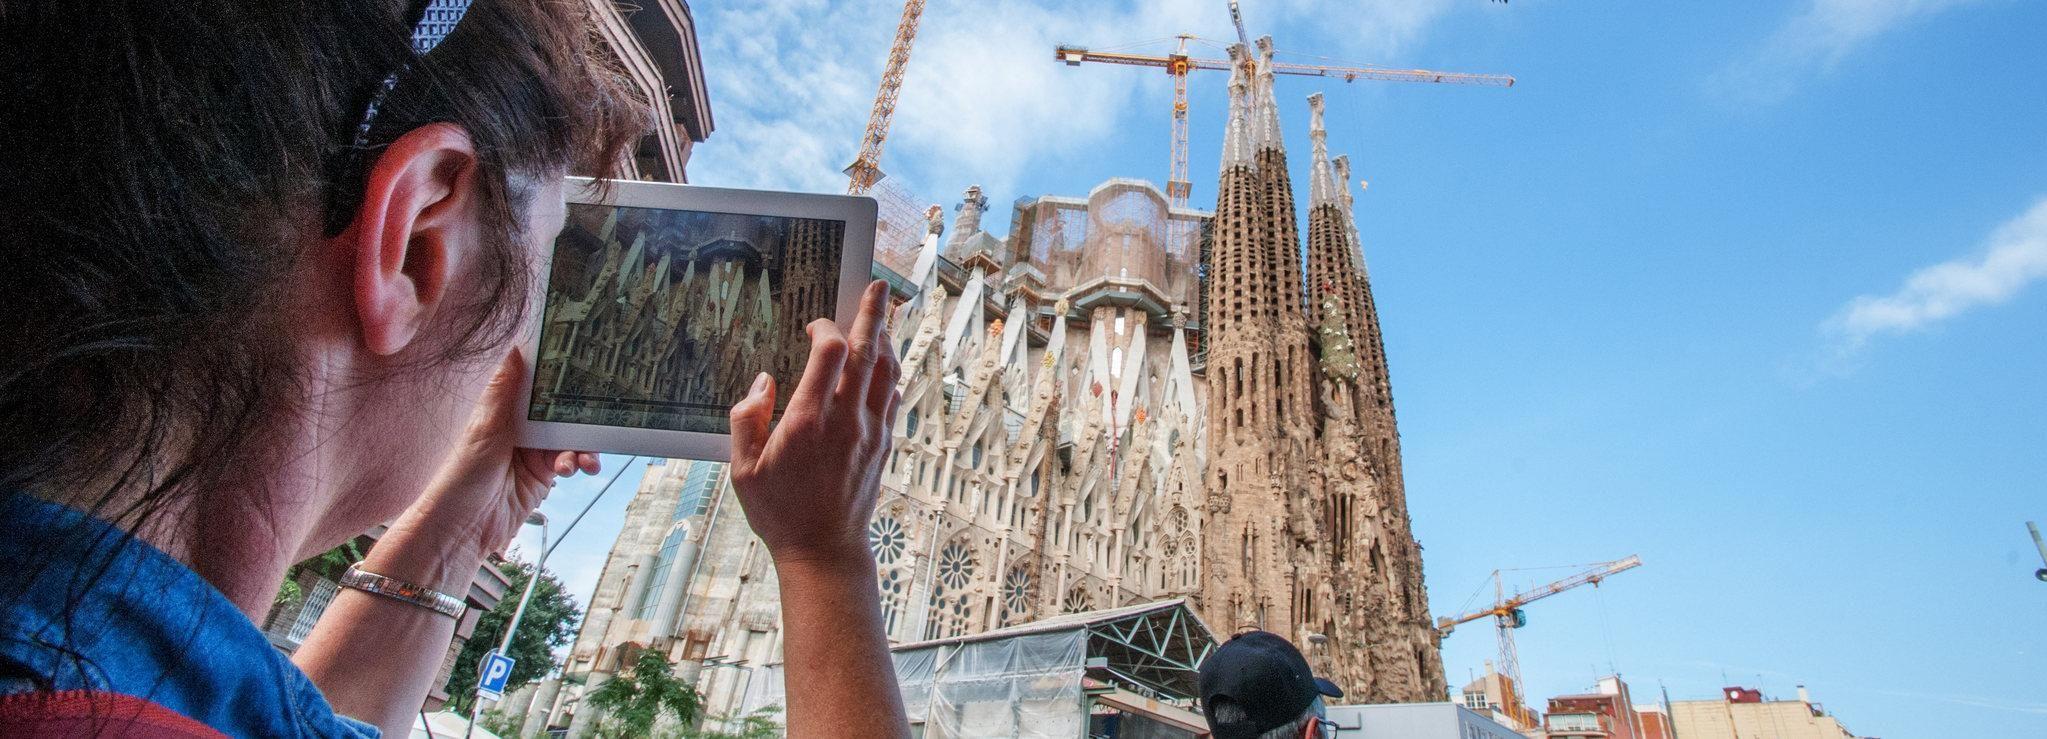 From Plaça Catalunya: Fast-Track Tour of Sagrada Familia